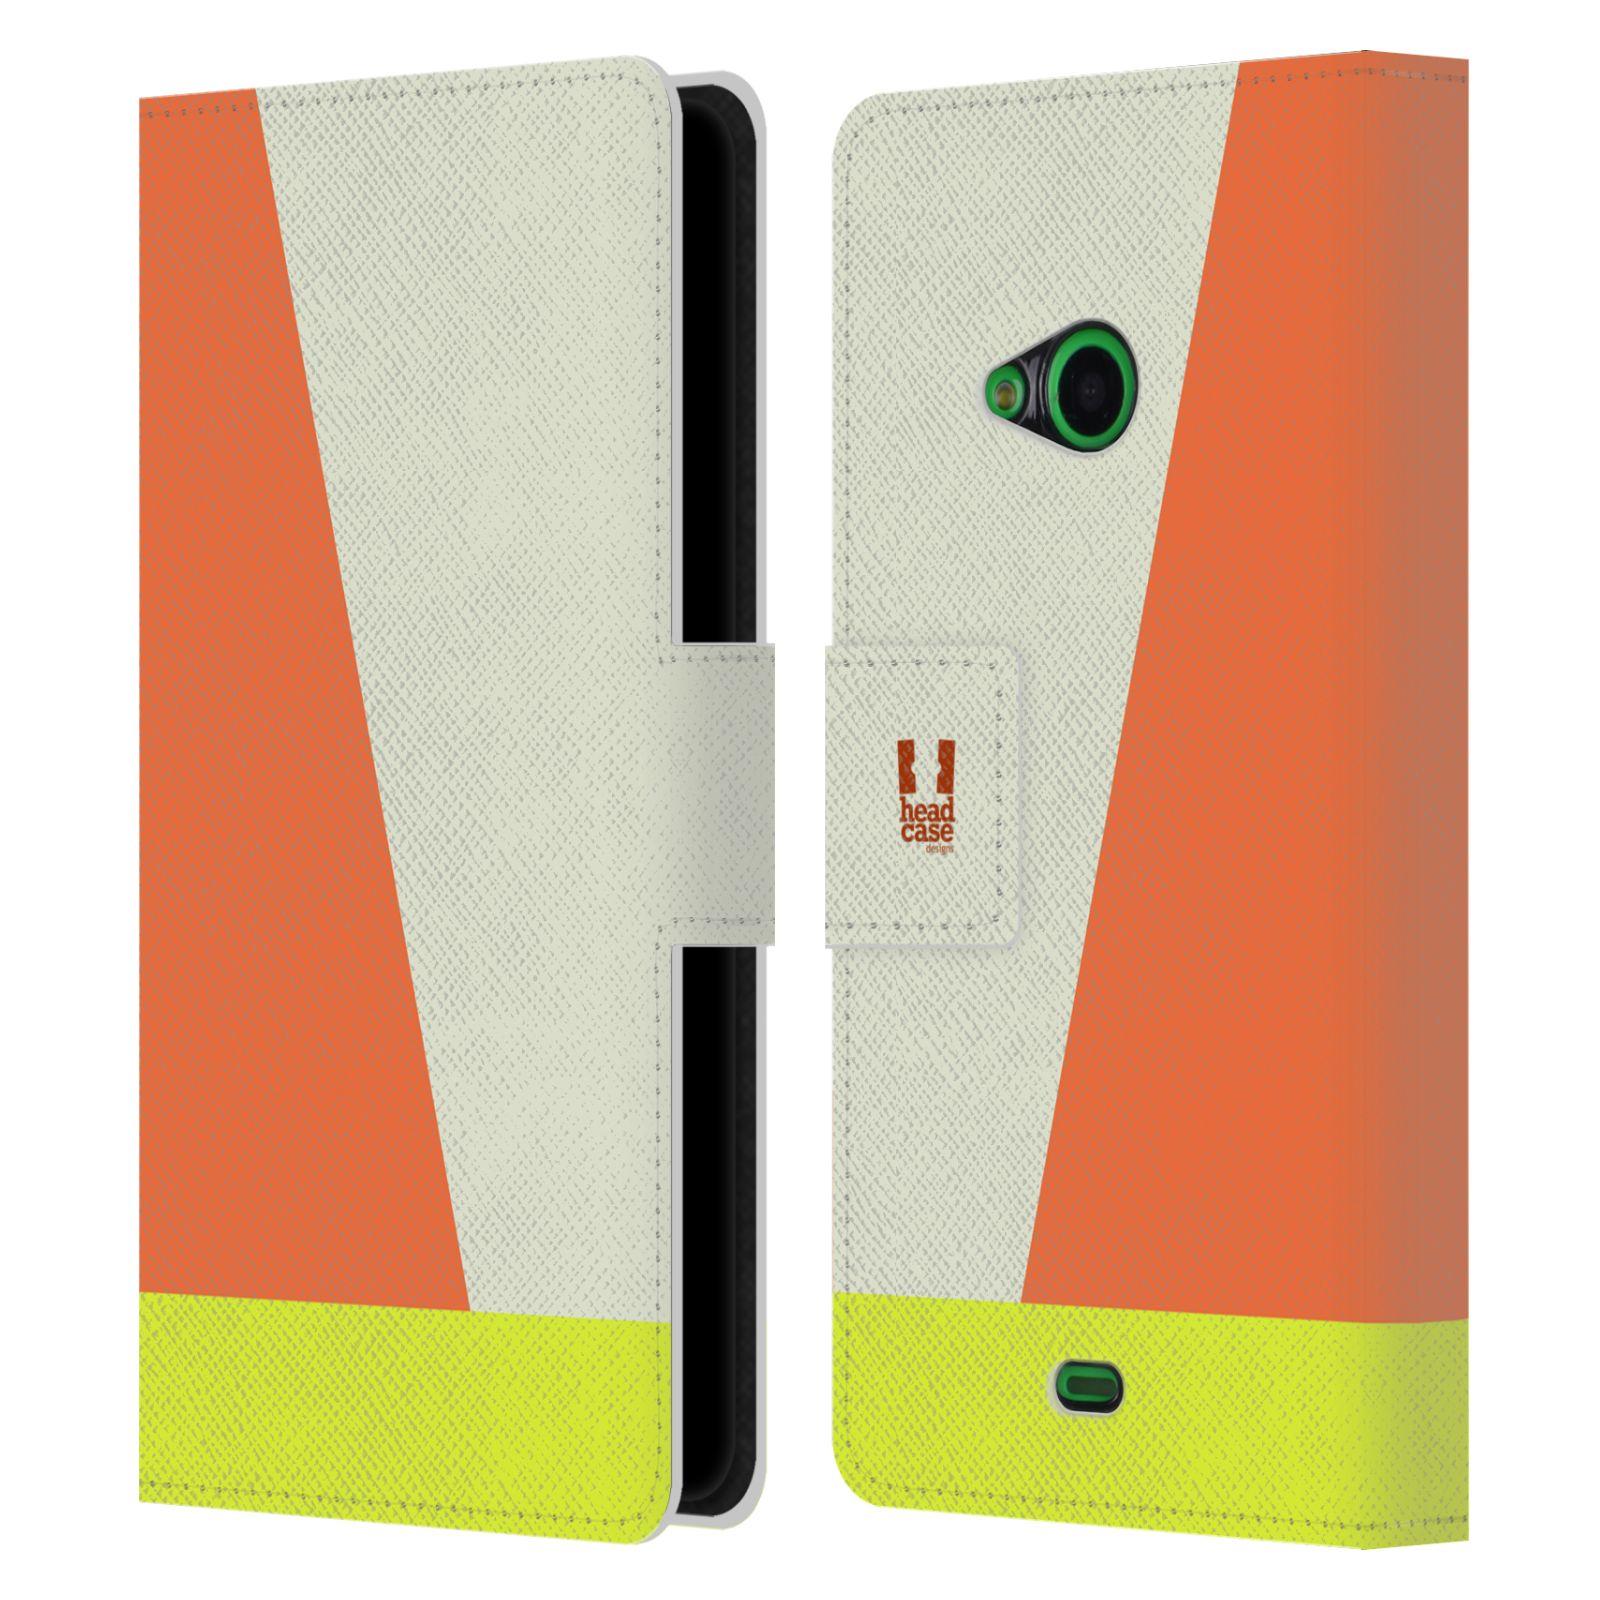 HEAD CASE Flipové pouzdro pro mobil Nokia LUMIA 535 barevné tvary slonová kost